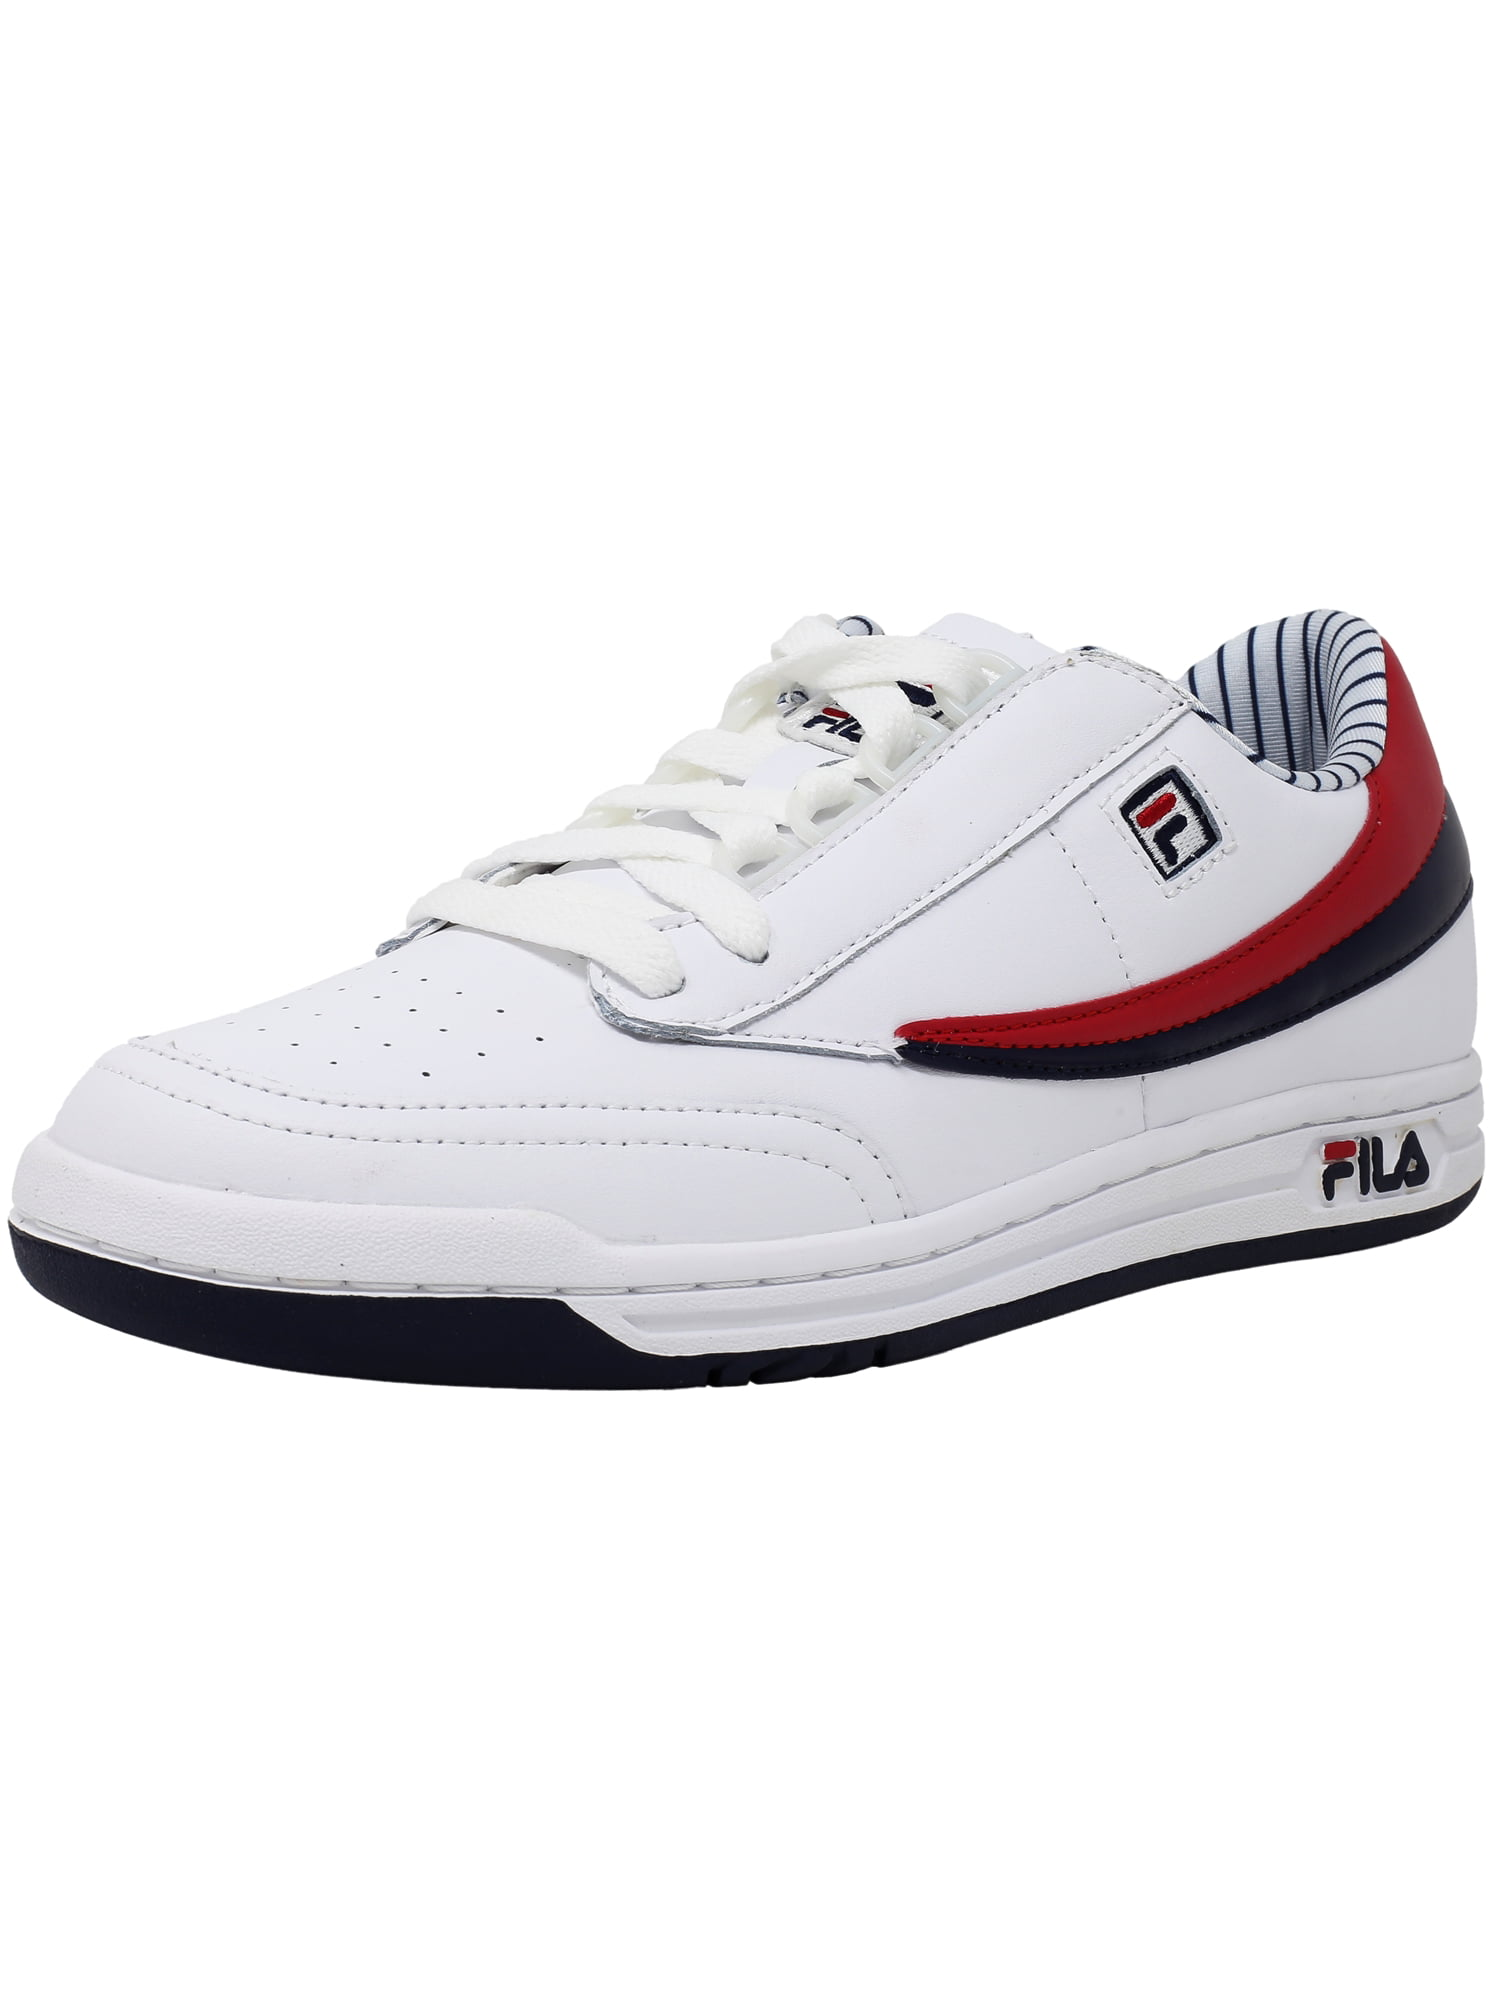 Fila Fila Men's Original Tennis White Navy Red Ankle High Shoe 9.5M